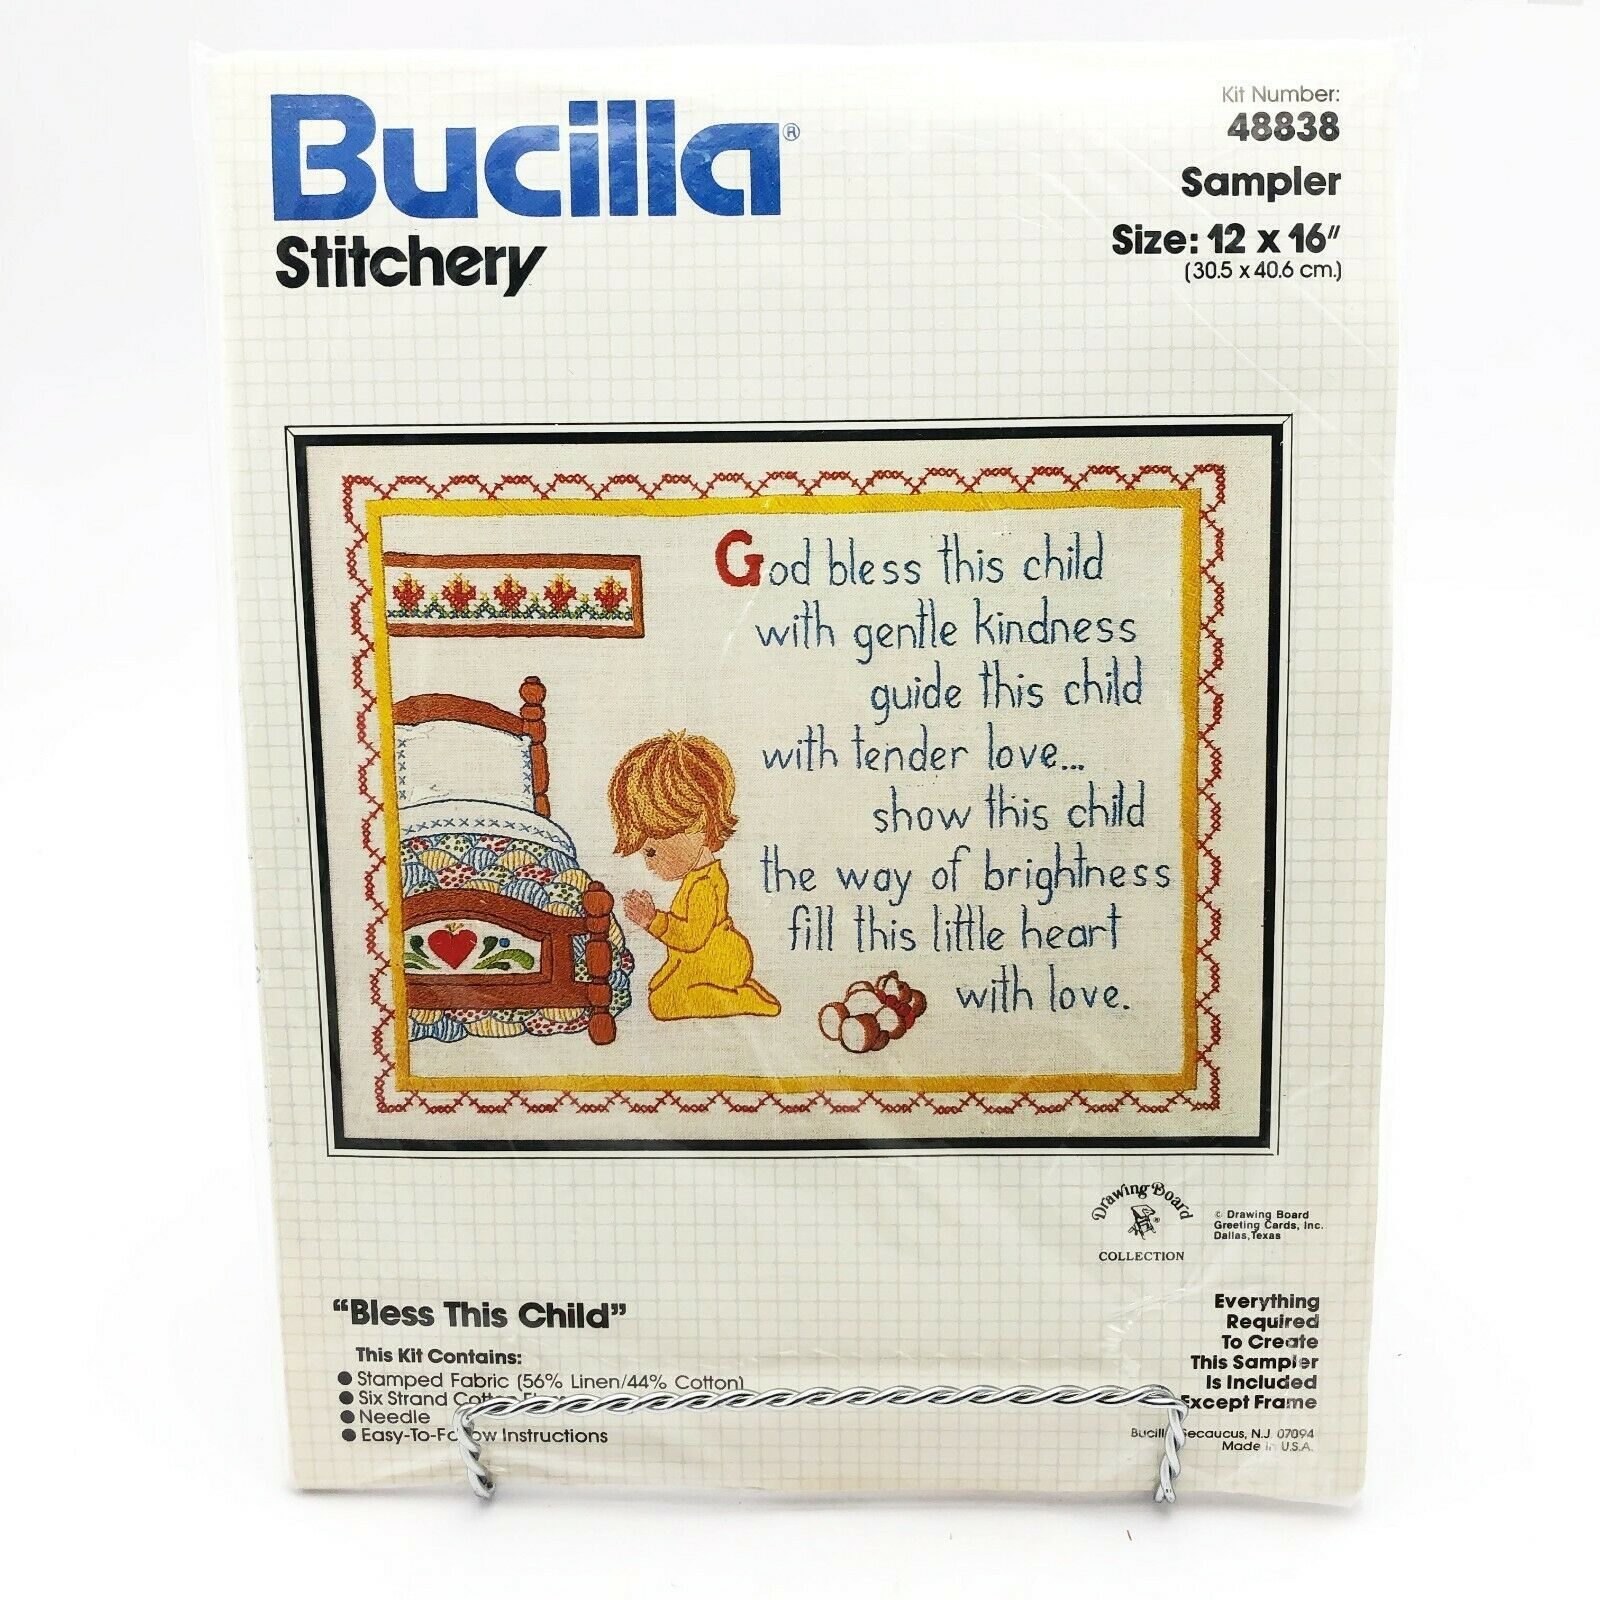 Vintage Bucilla Sampler Embroidery Kit Bless This Child 48838 Bedtime Prayer - $15.58